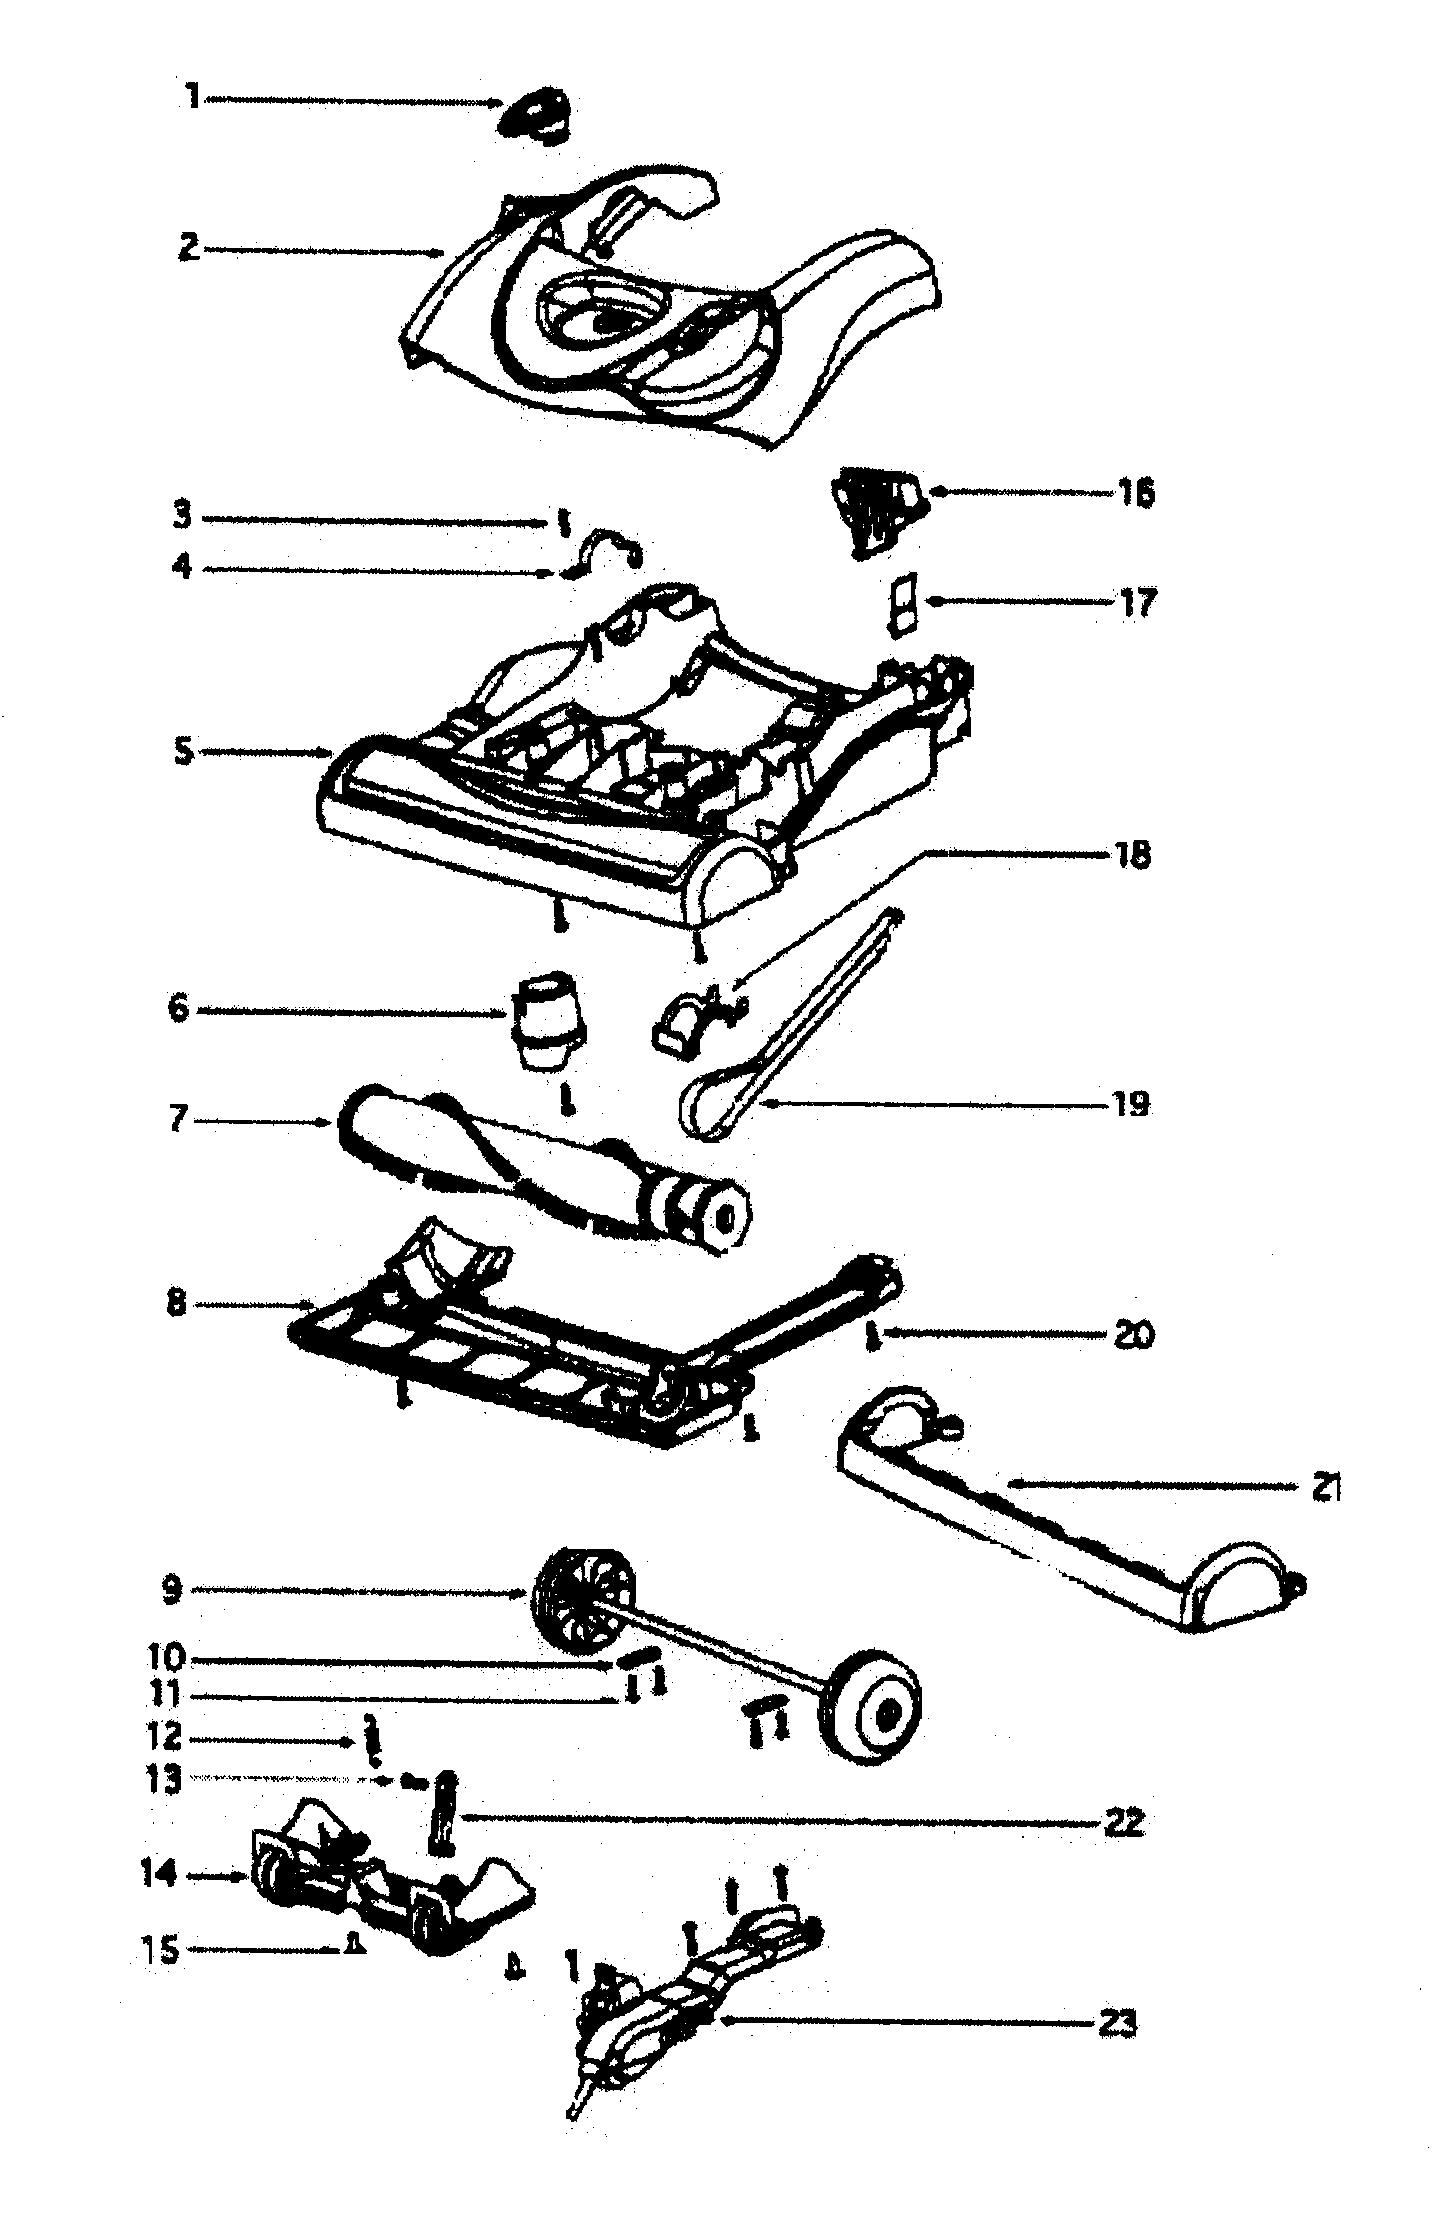 BASE ASSY Diagram & Parts List for Model 4870hz Eureka